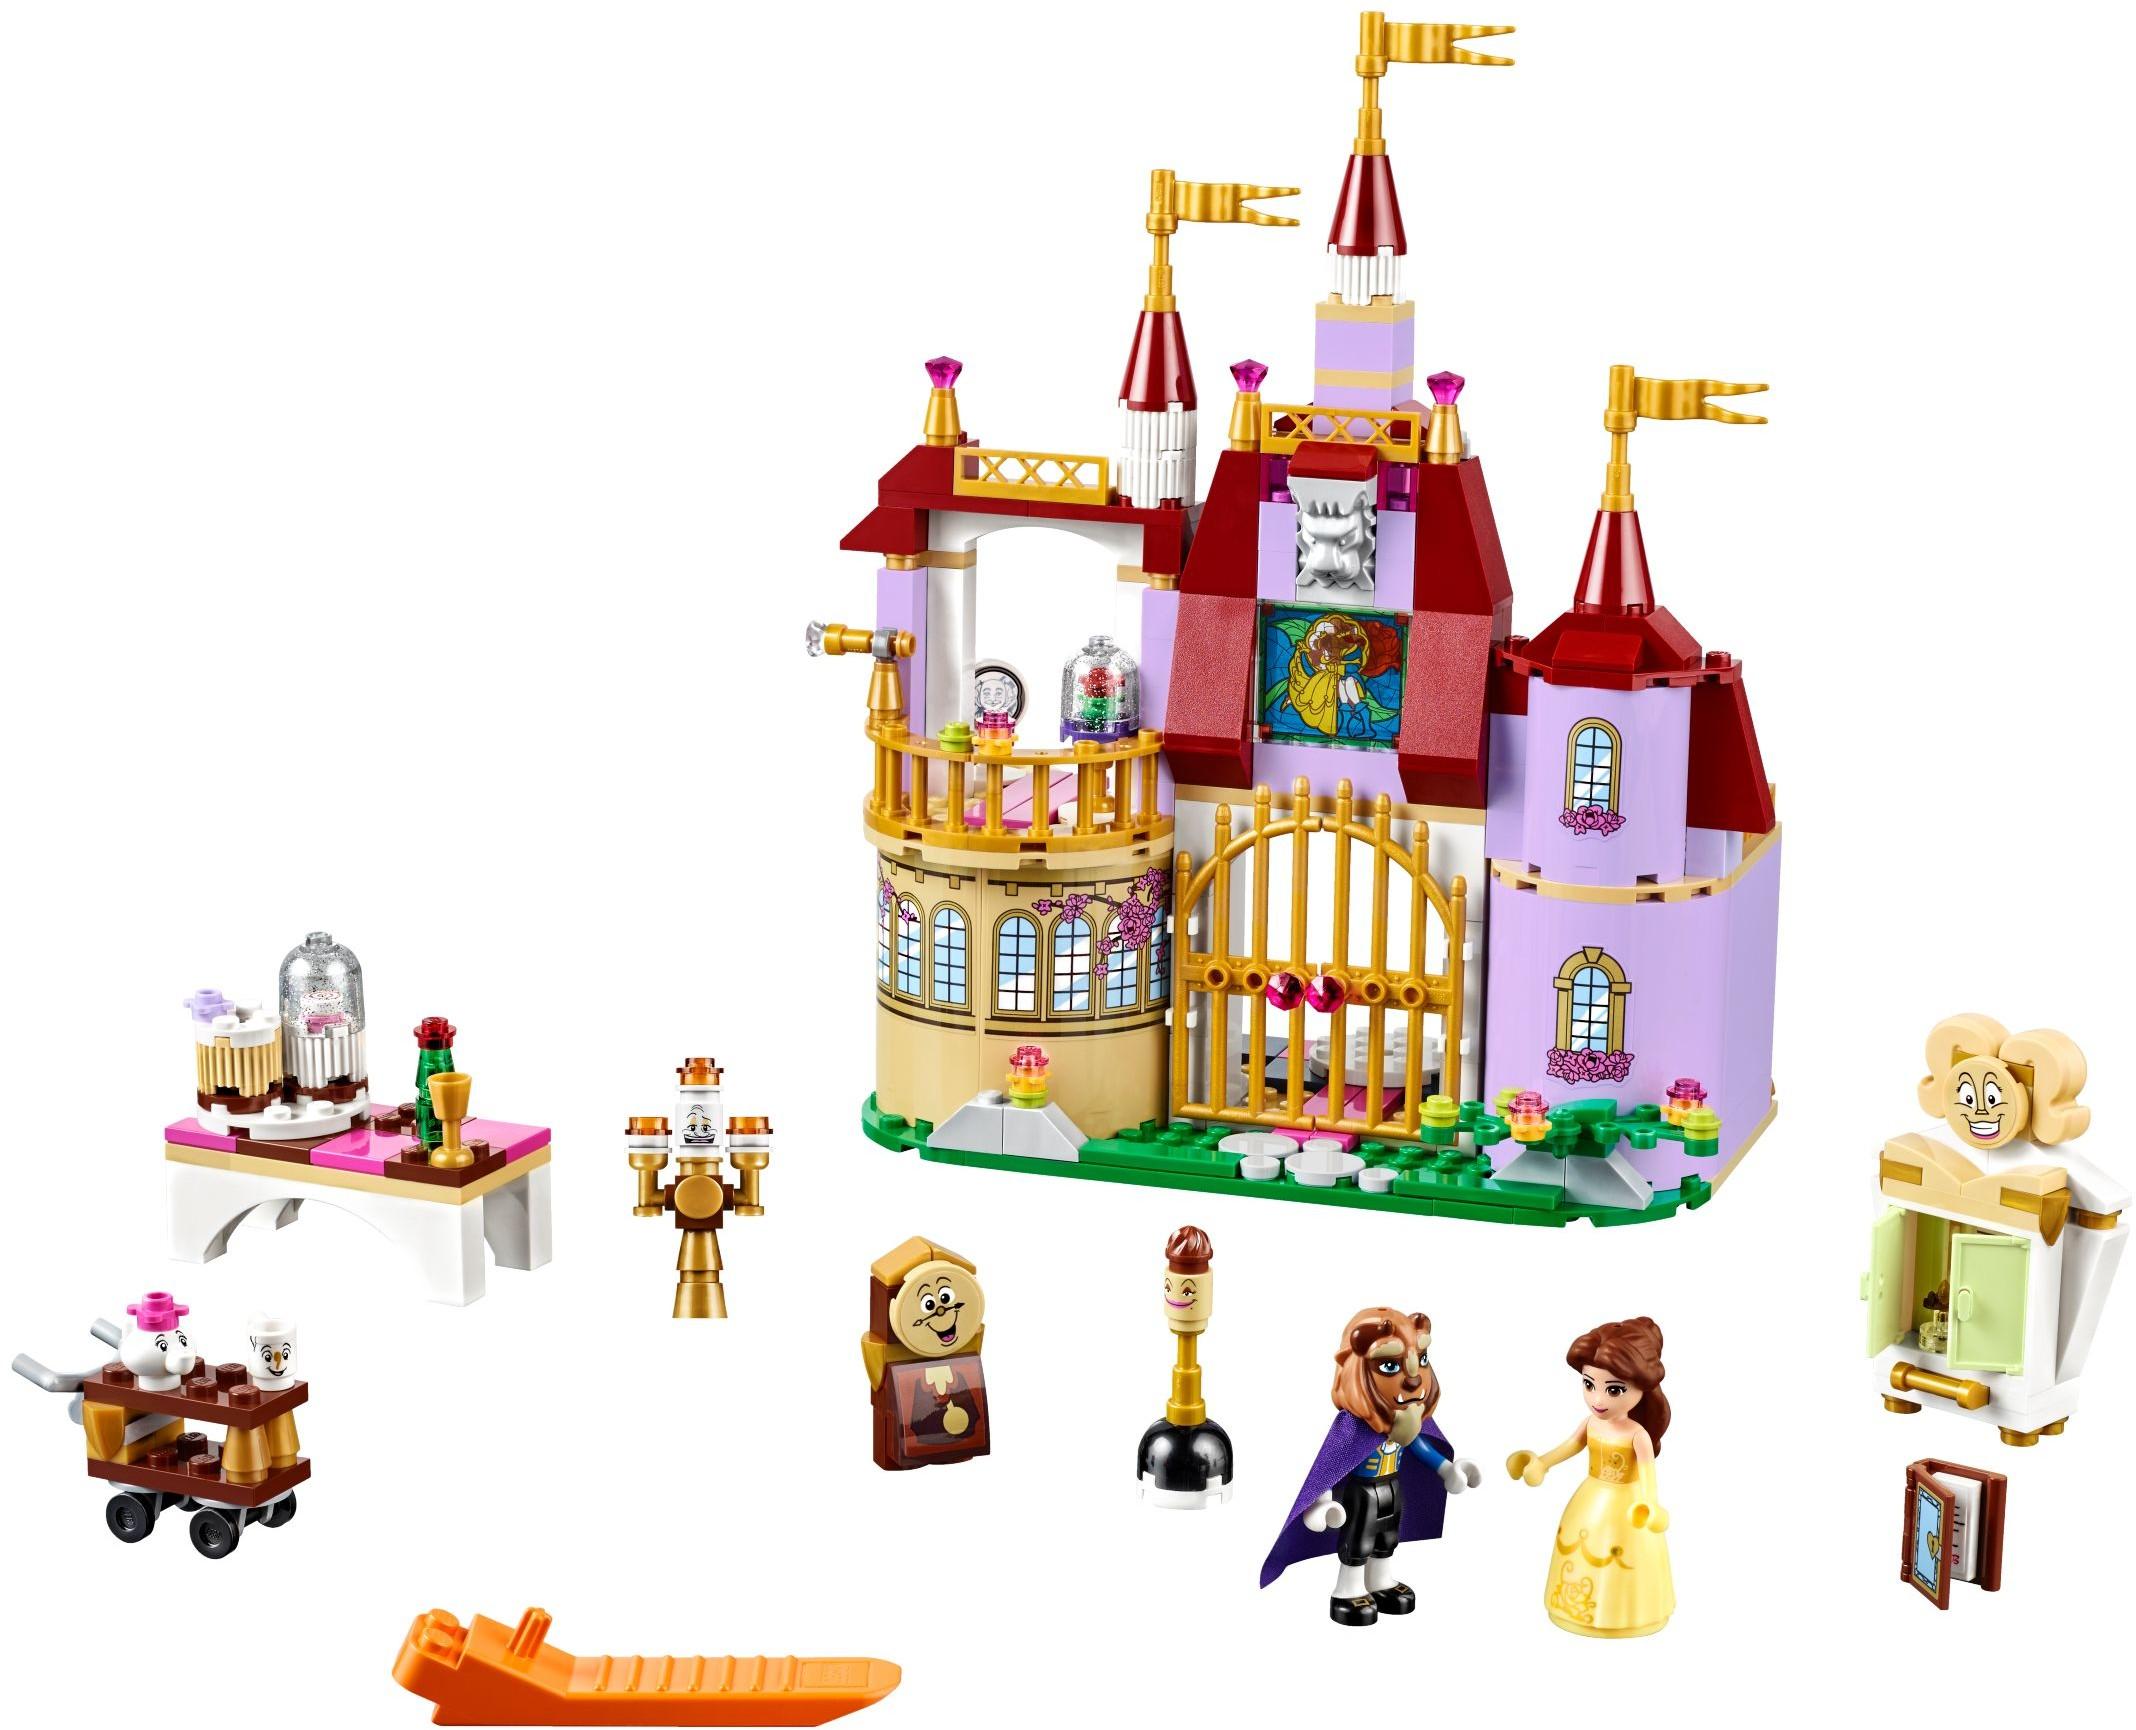 Disney Princess Chi Lego 41060 Sleeping Beautyamp039s Royal Bedroom 41067 Belles Enchanted Castle